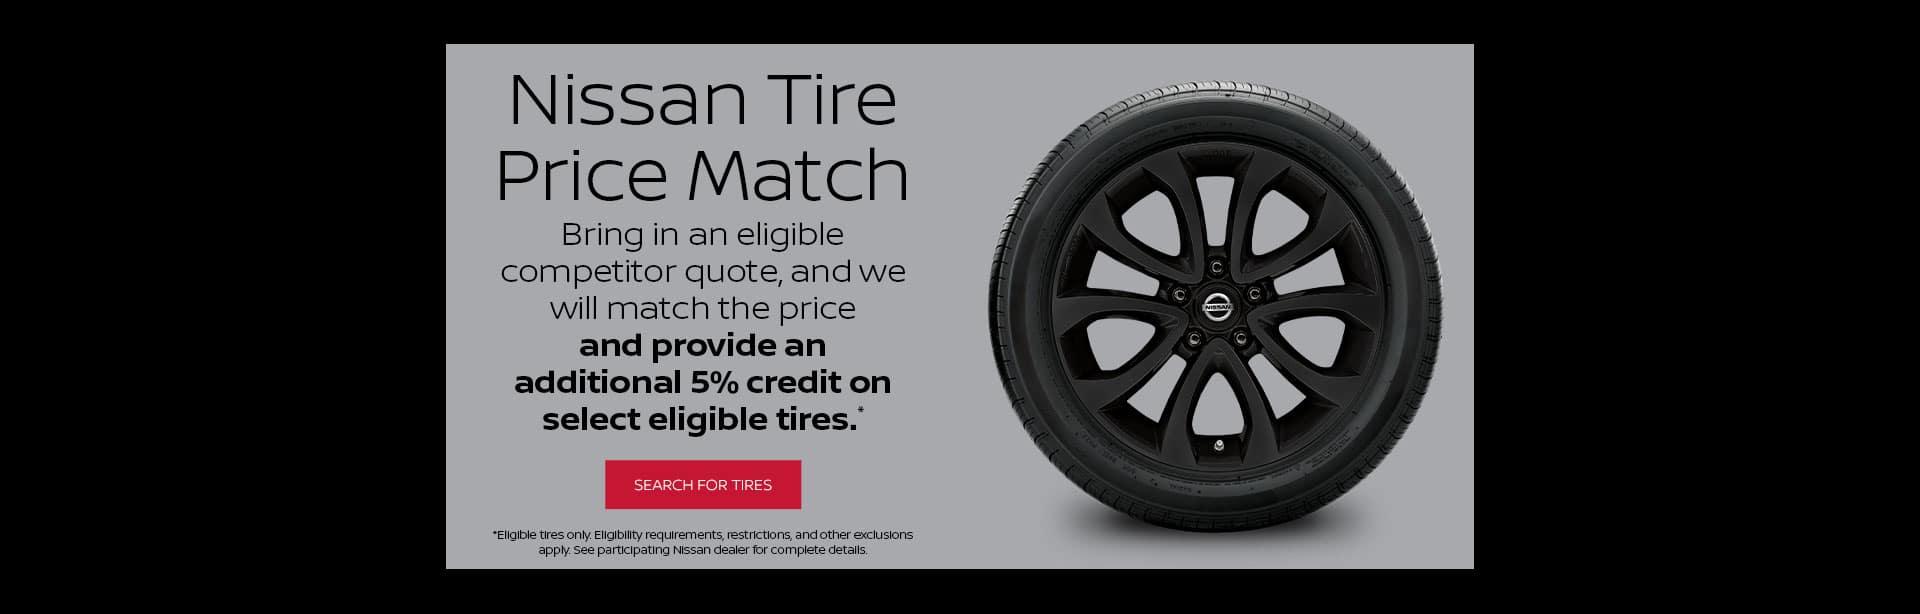 Tire-Price-Match-june-2021